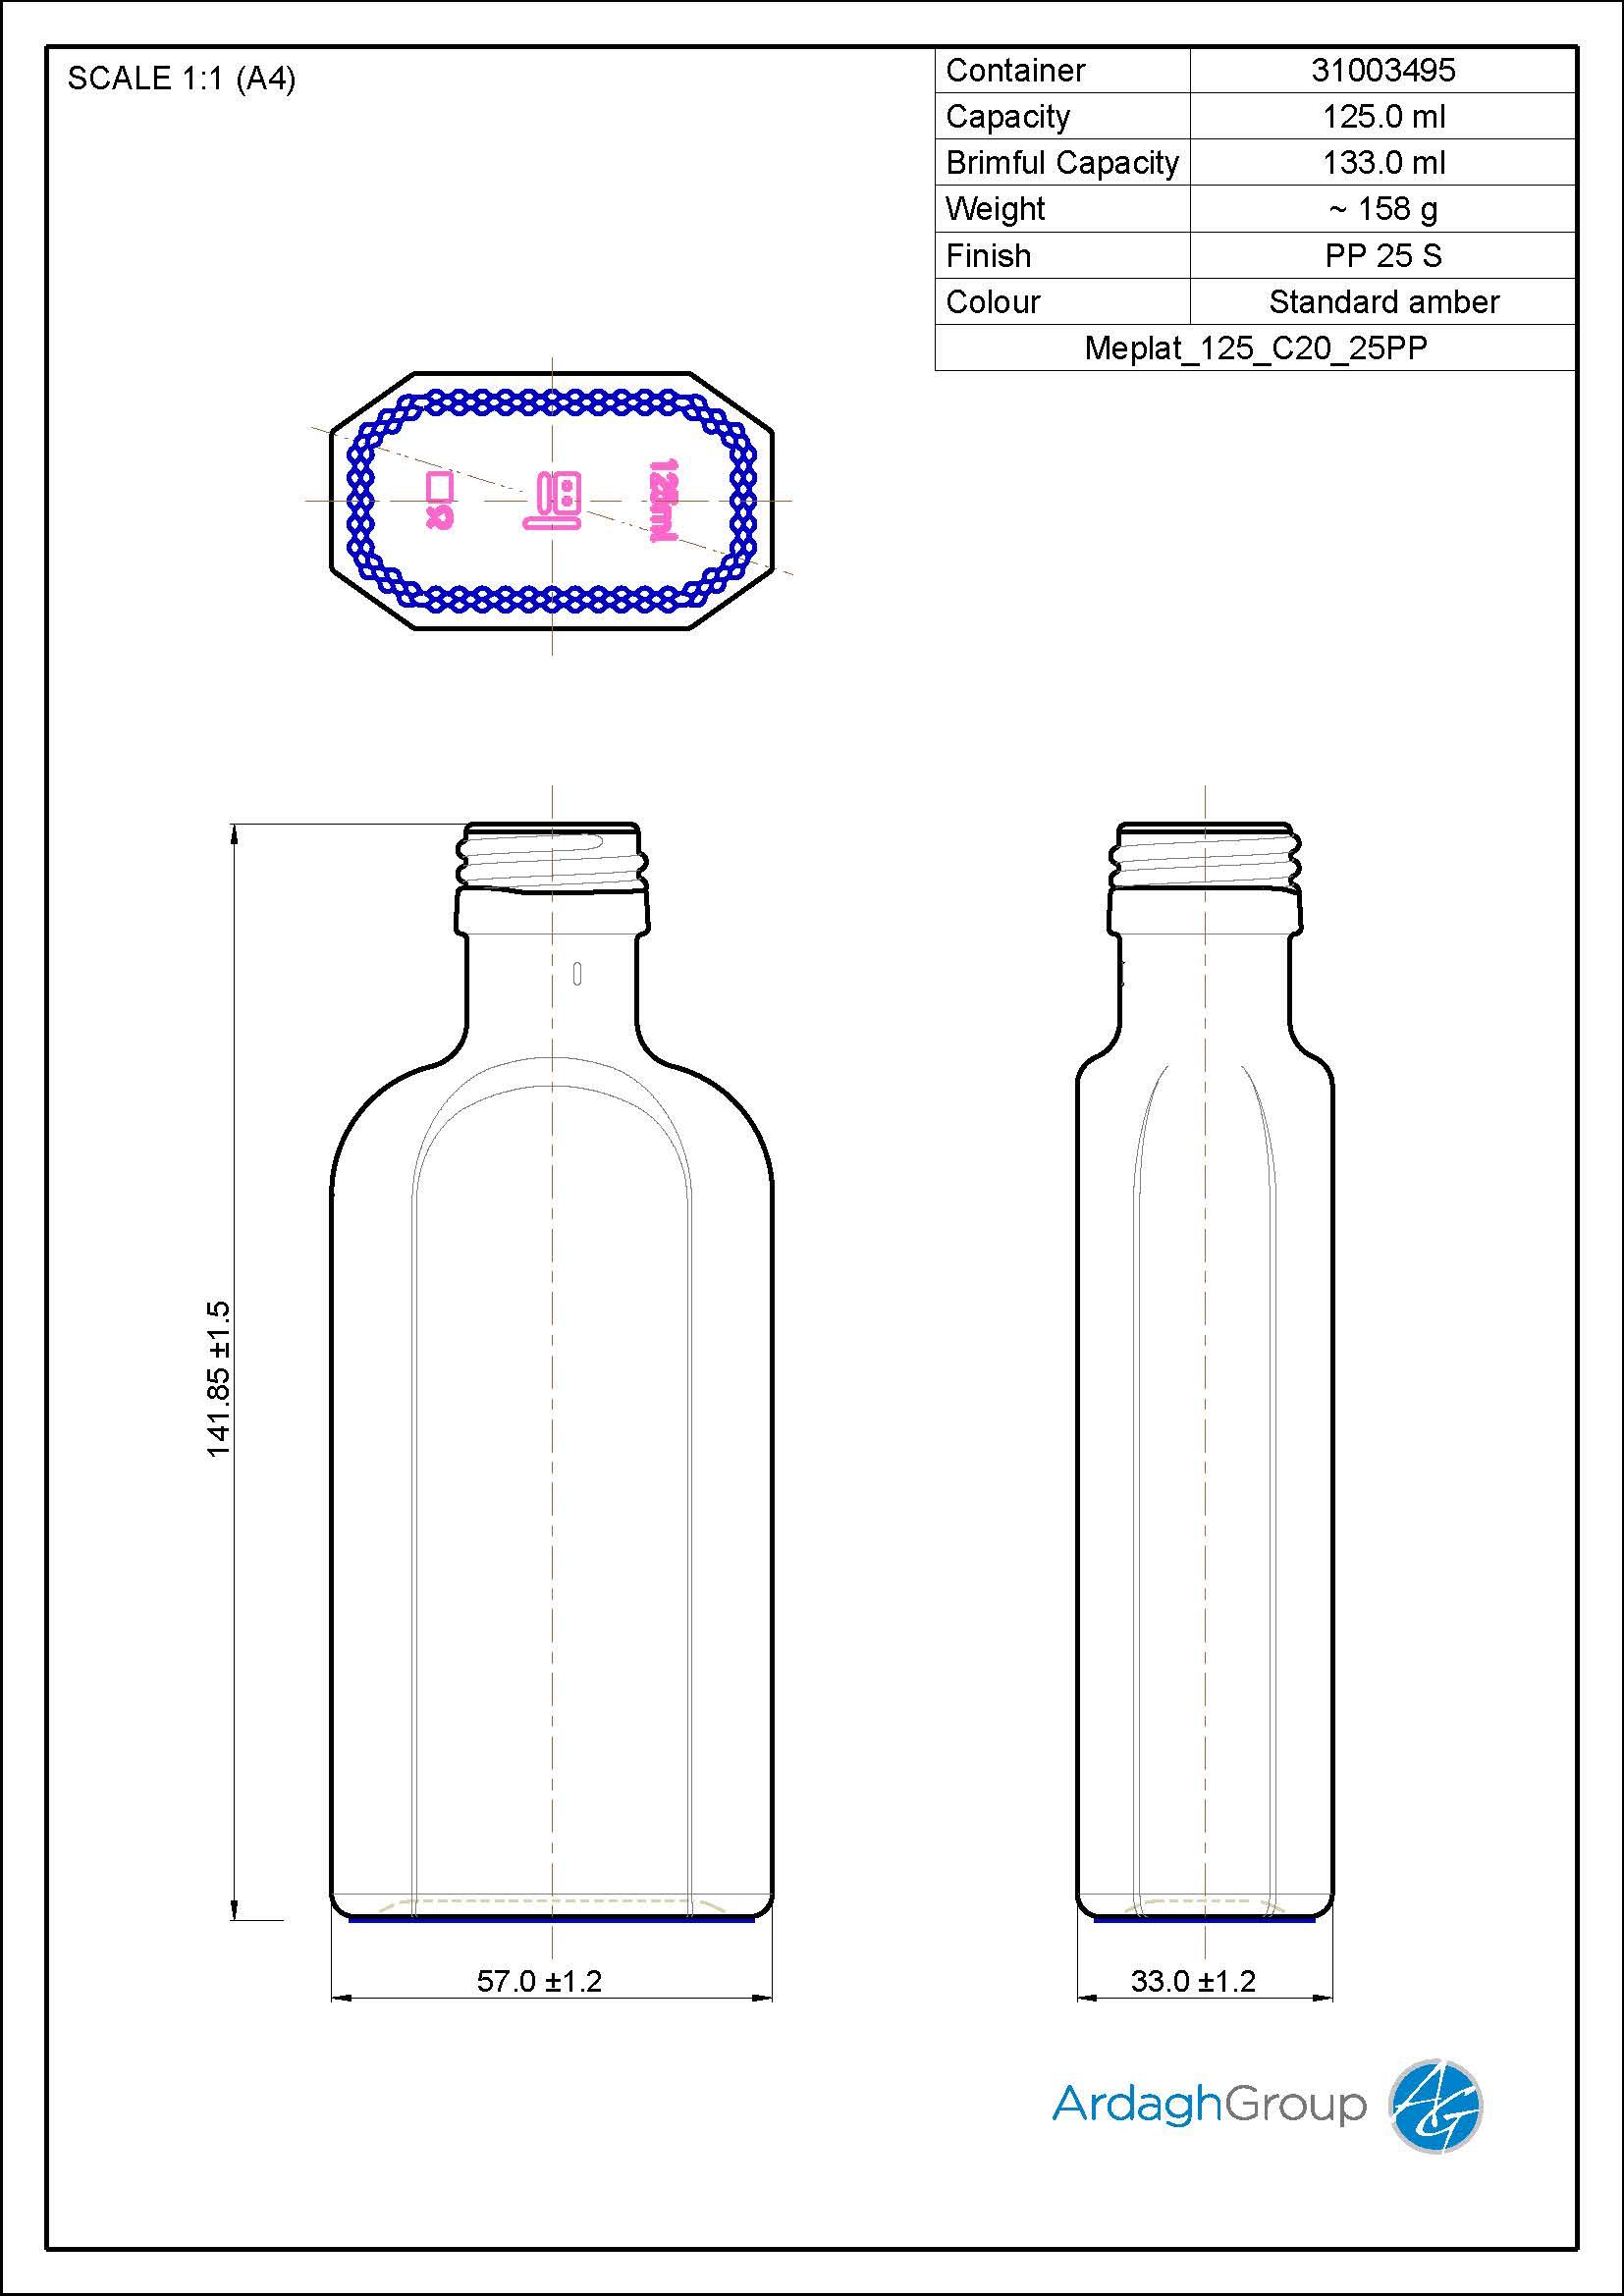 125ml amber glass meplat bottle